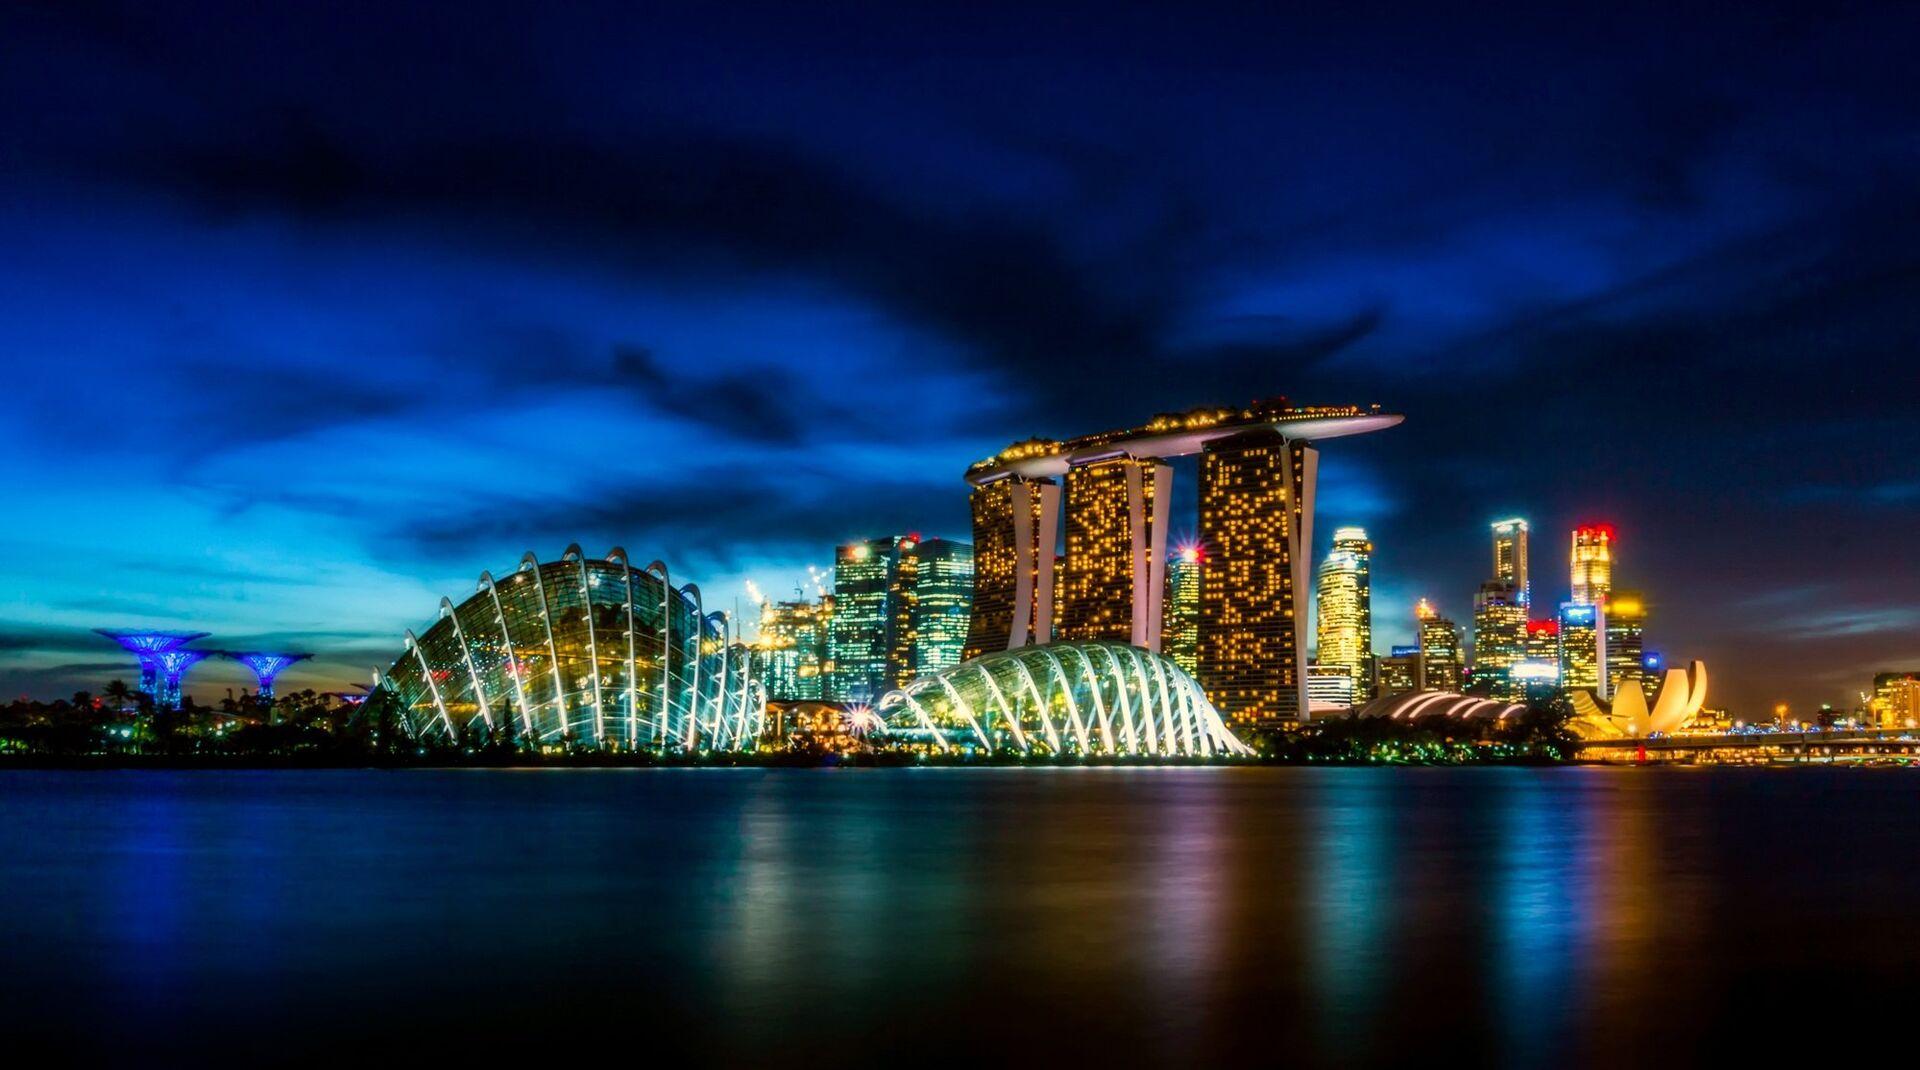 Singapur, foto de archivo - Sputnik Mundo, 1920, 09.08.2021